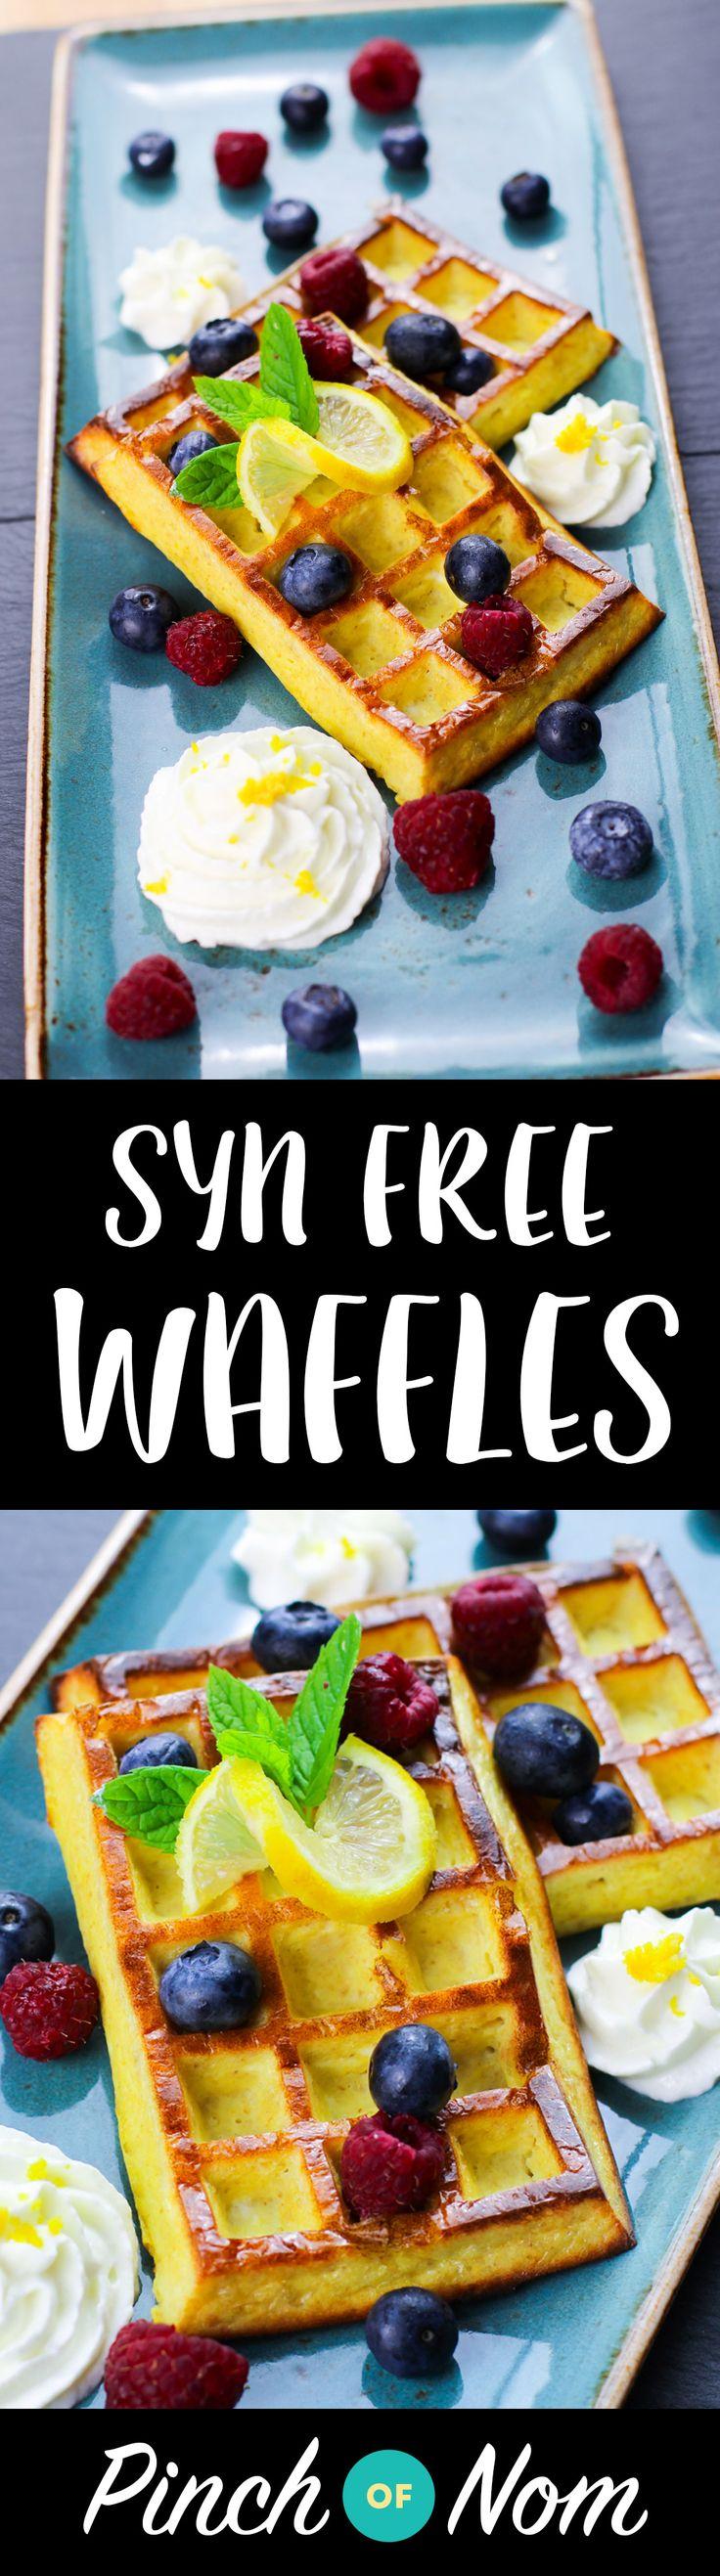 Syn Free Lemon & Blueberry Waffles | Slimming World - http://pinchofnom.com/recipes/syn-free-lemon-blueberry-waffles/